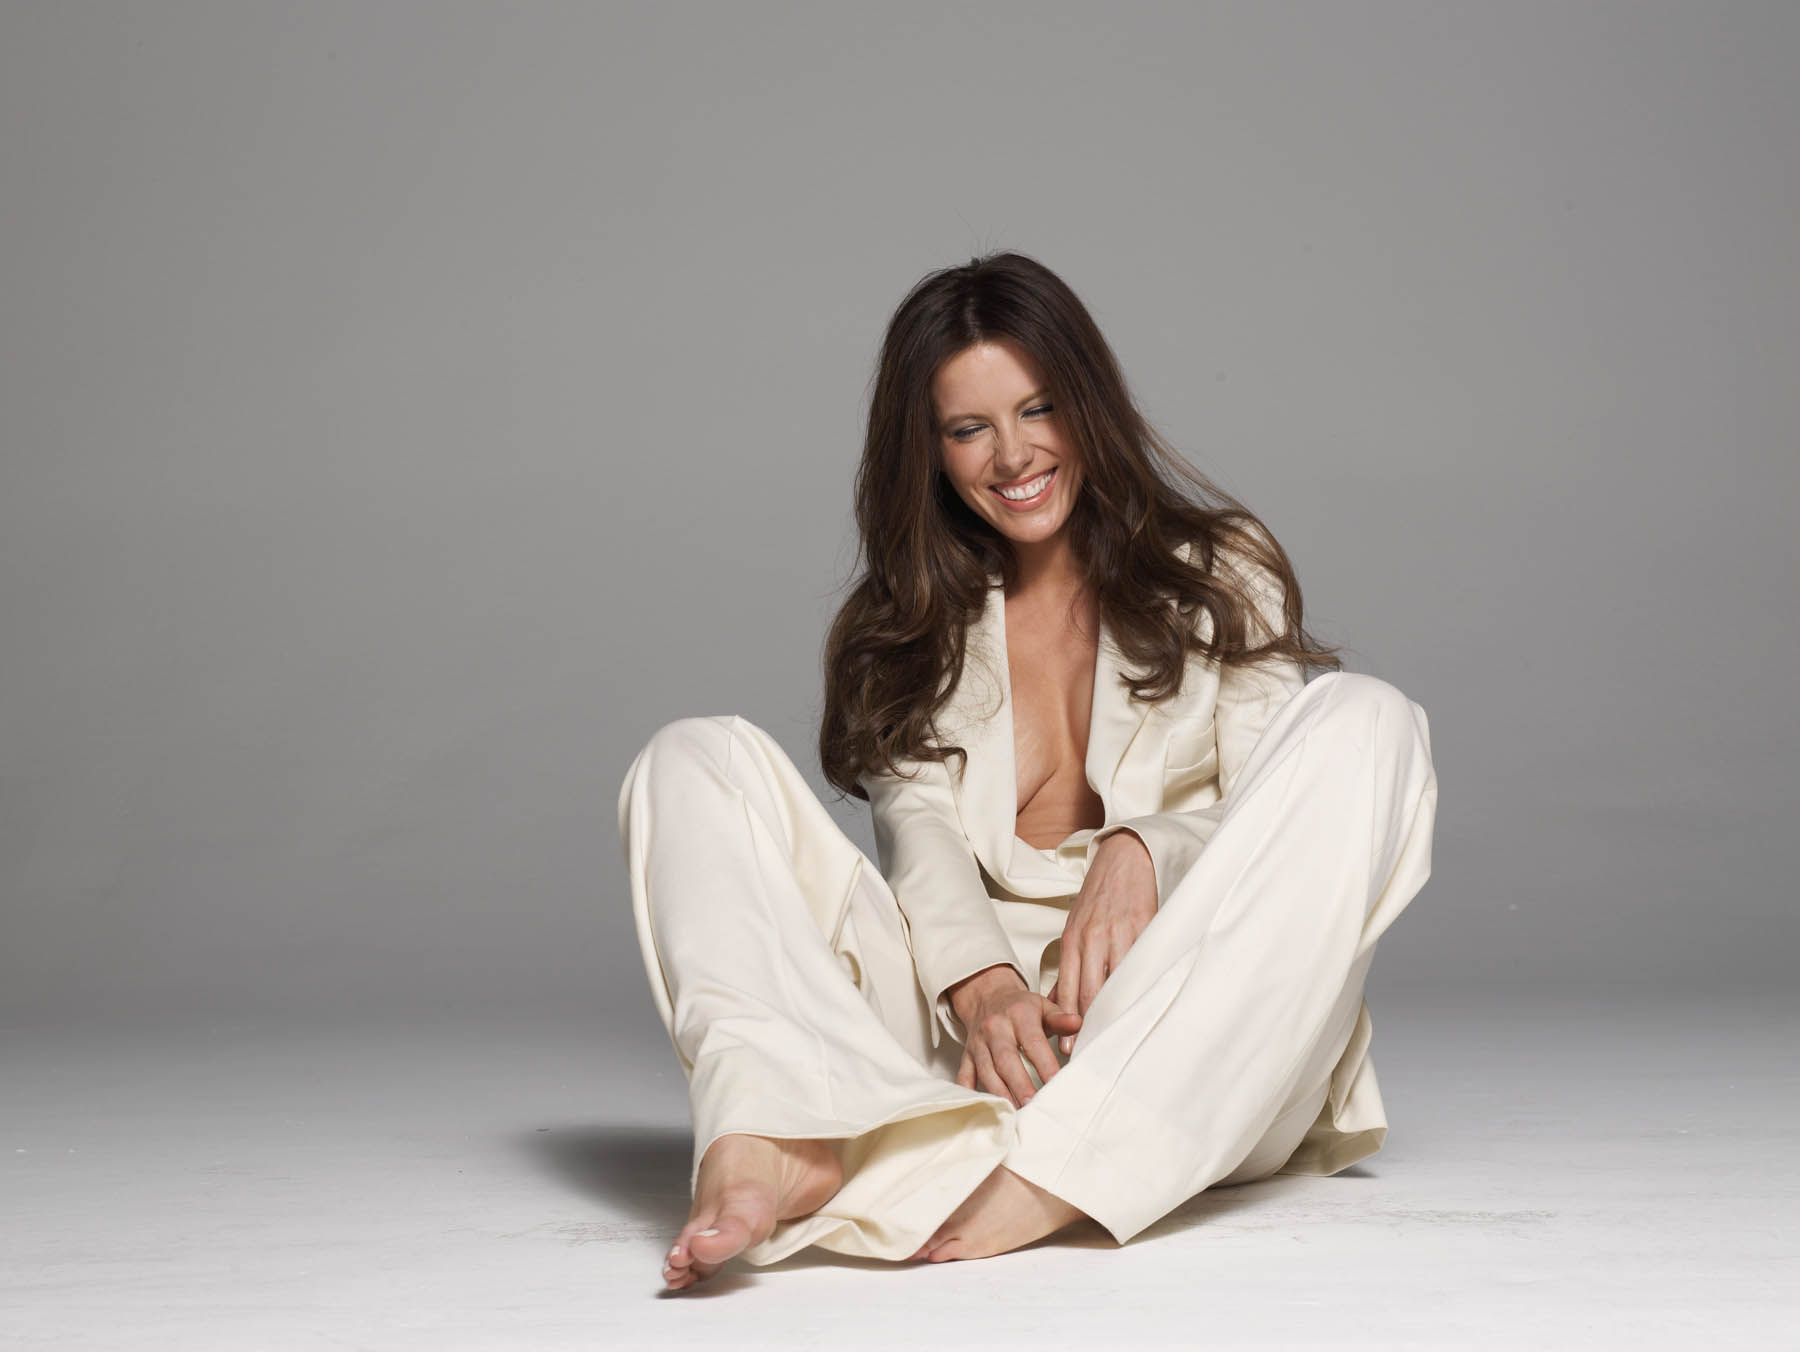 Attractive White Suit 15 CELEB Kate Beckinsale